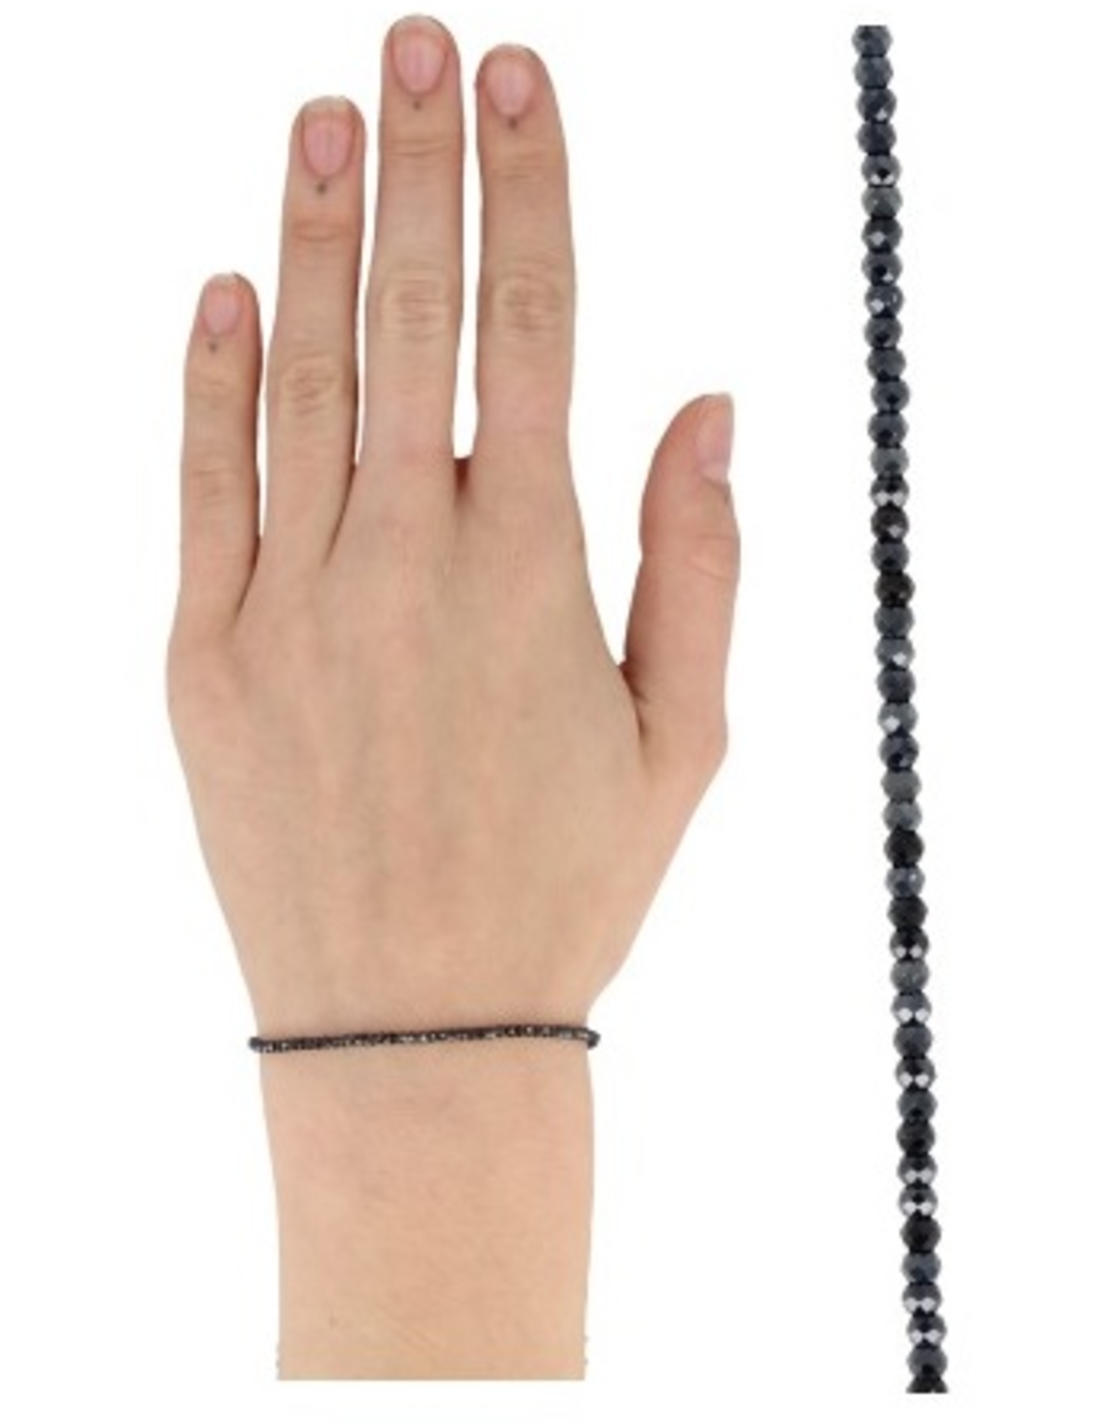 Spinel zwart met coating summer vibes armband